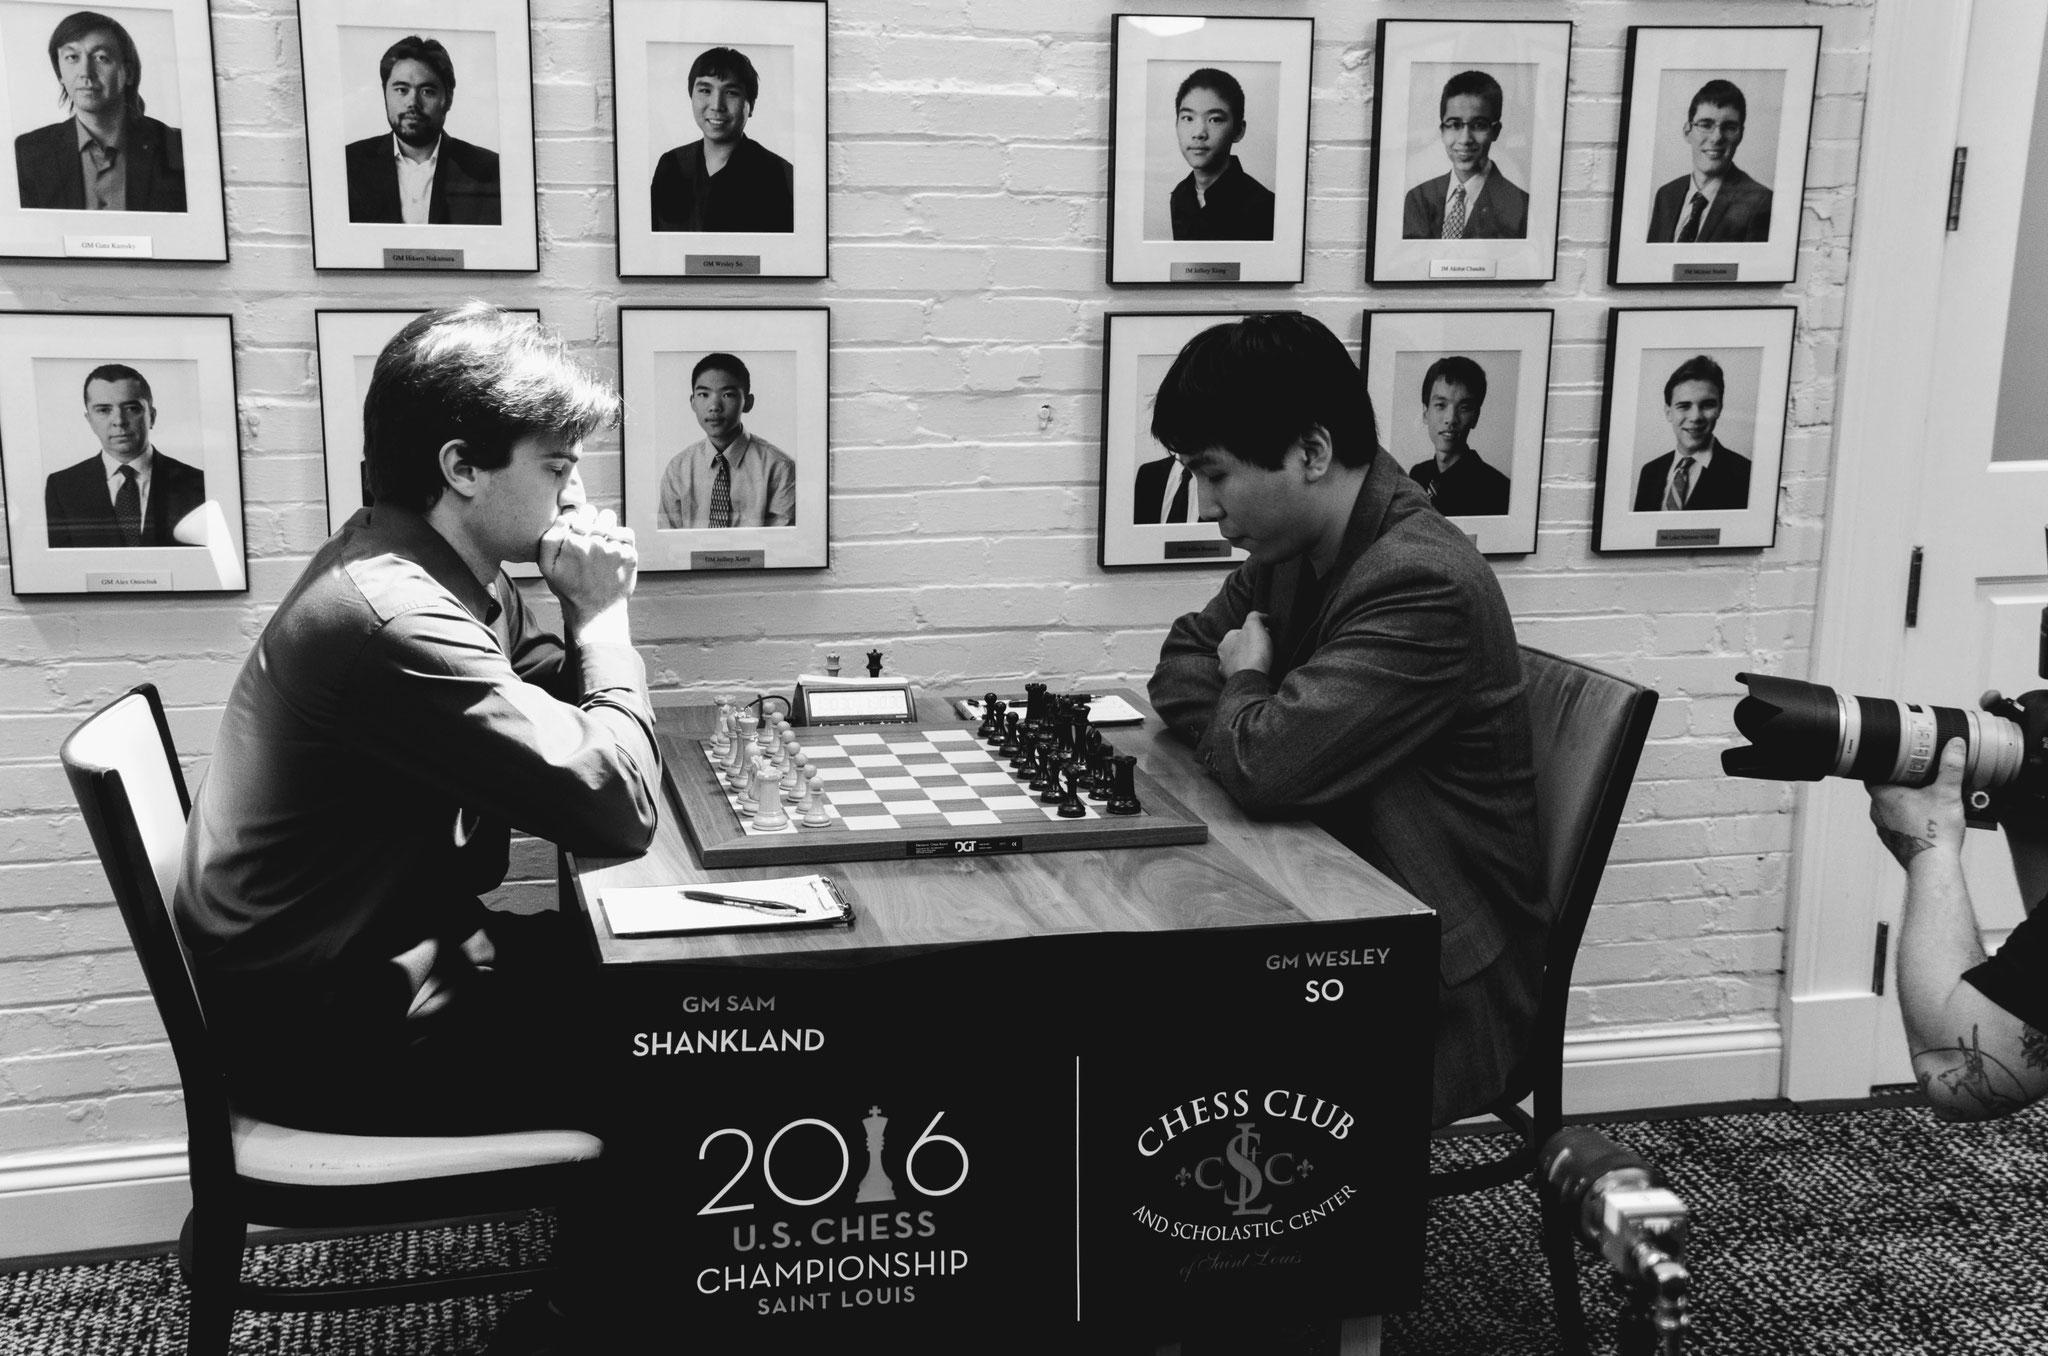 St. Louis - 2016 - Sam Shankland, Wesley So - U.S. Chess Championship